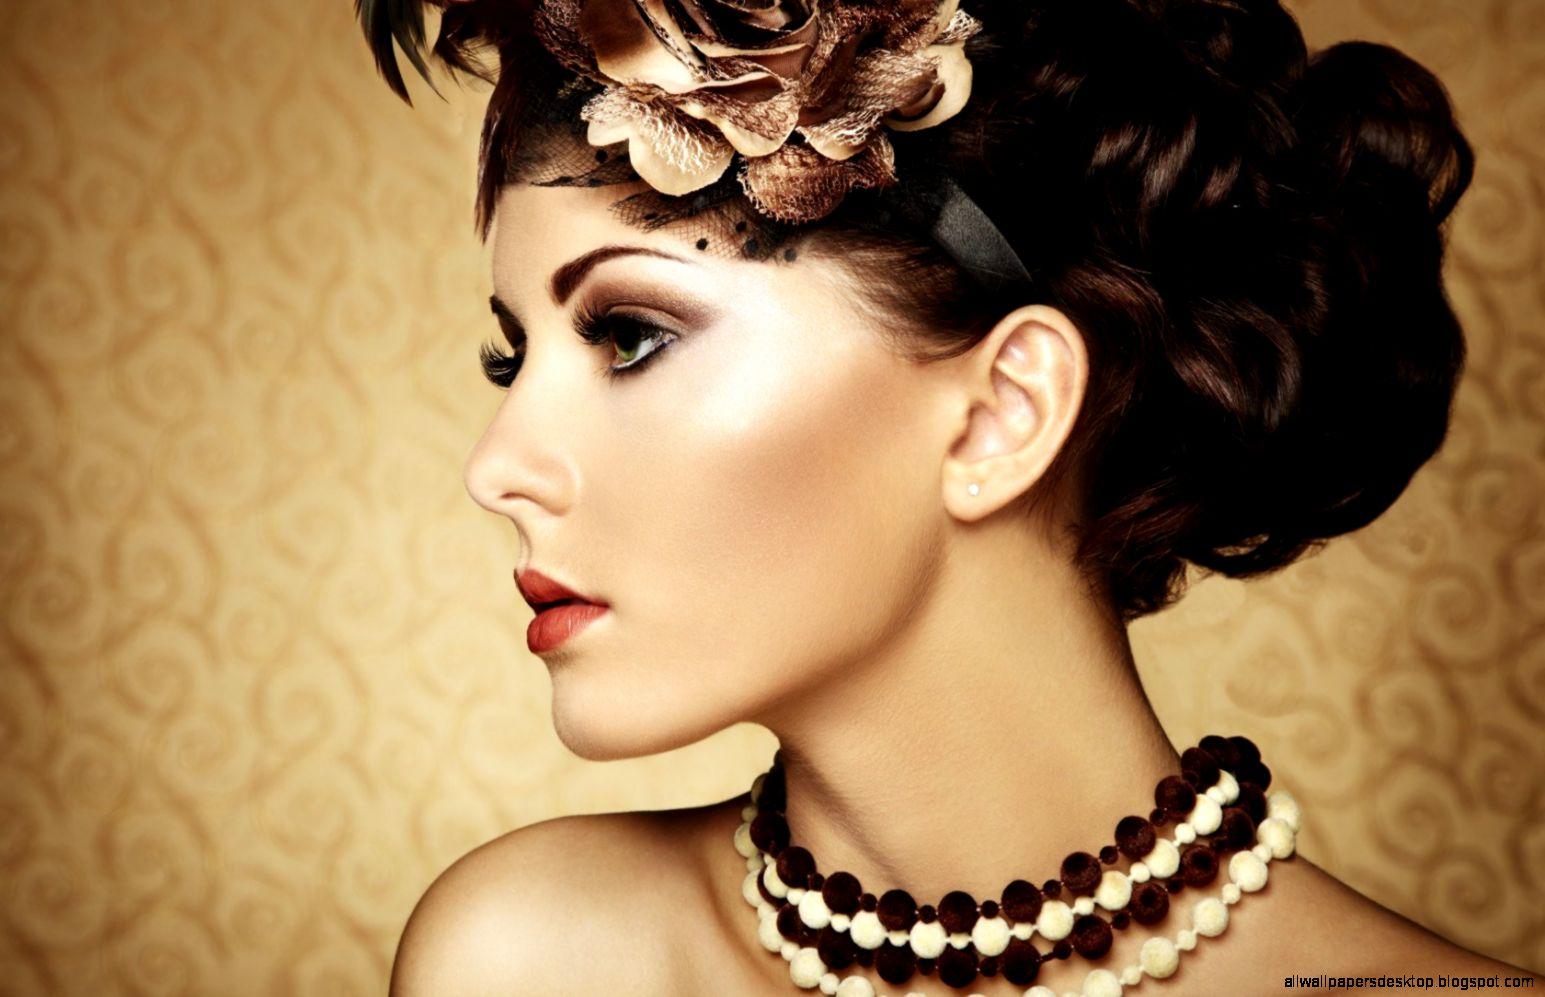 Girl Makeup Profile Style HD Wallpaper   FreeWallsUp